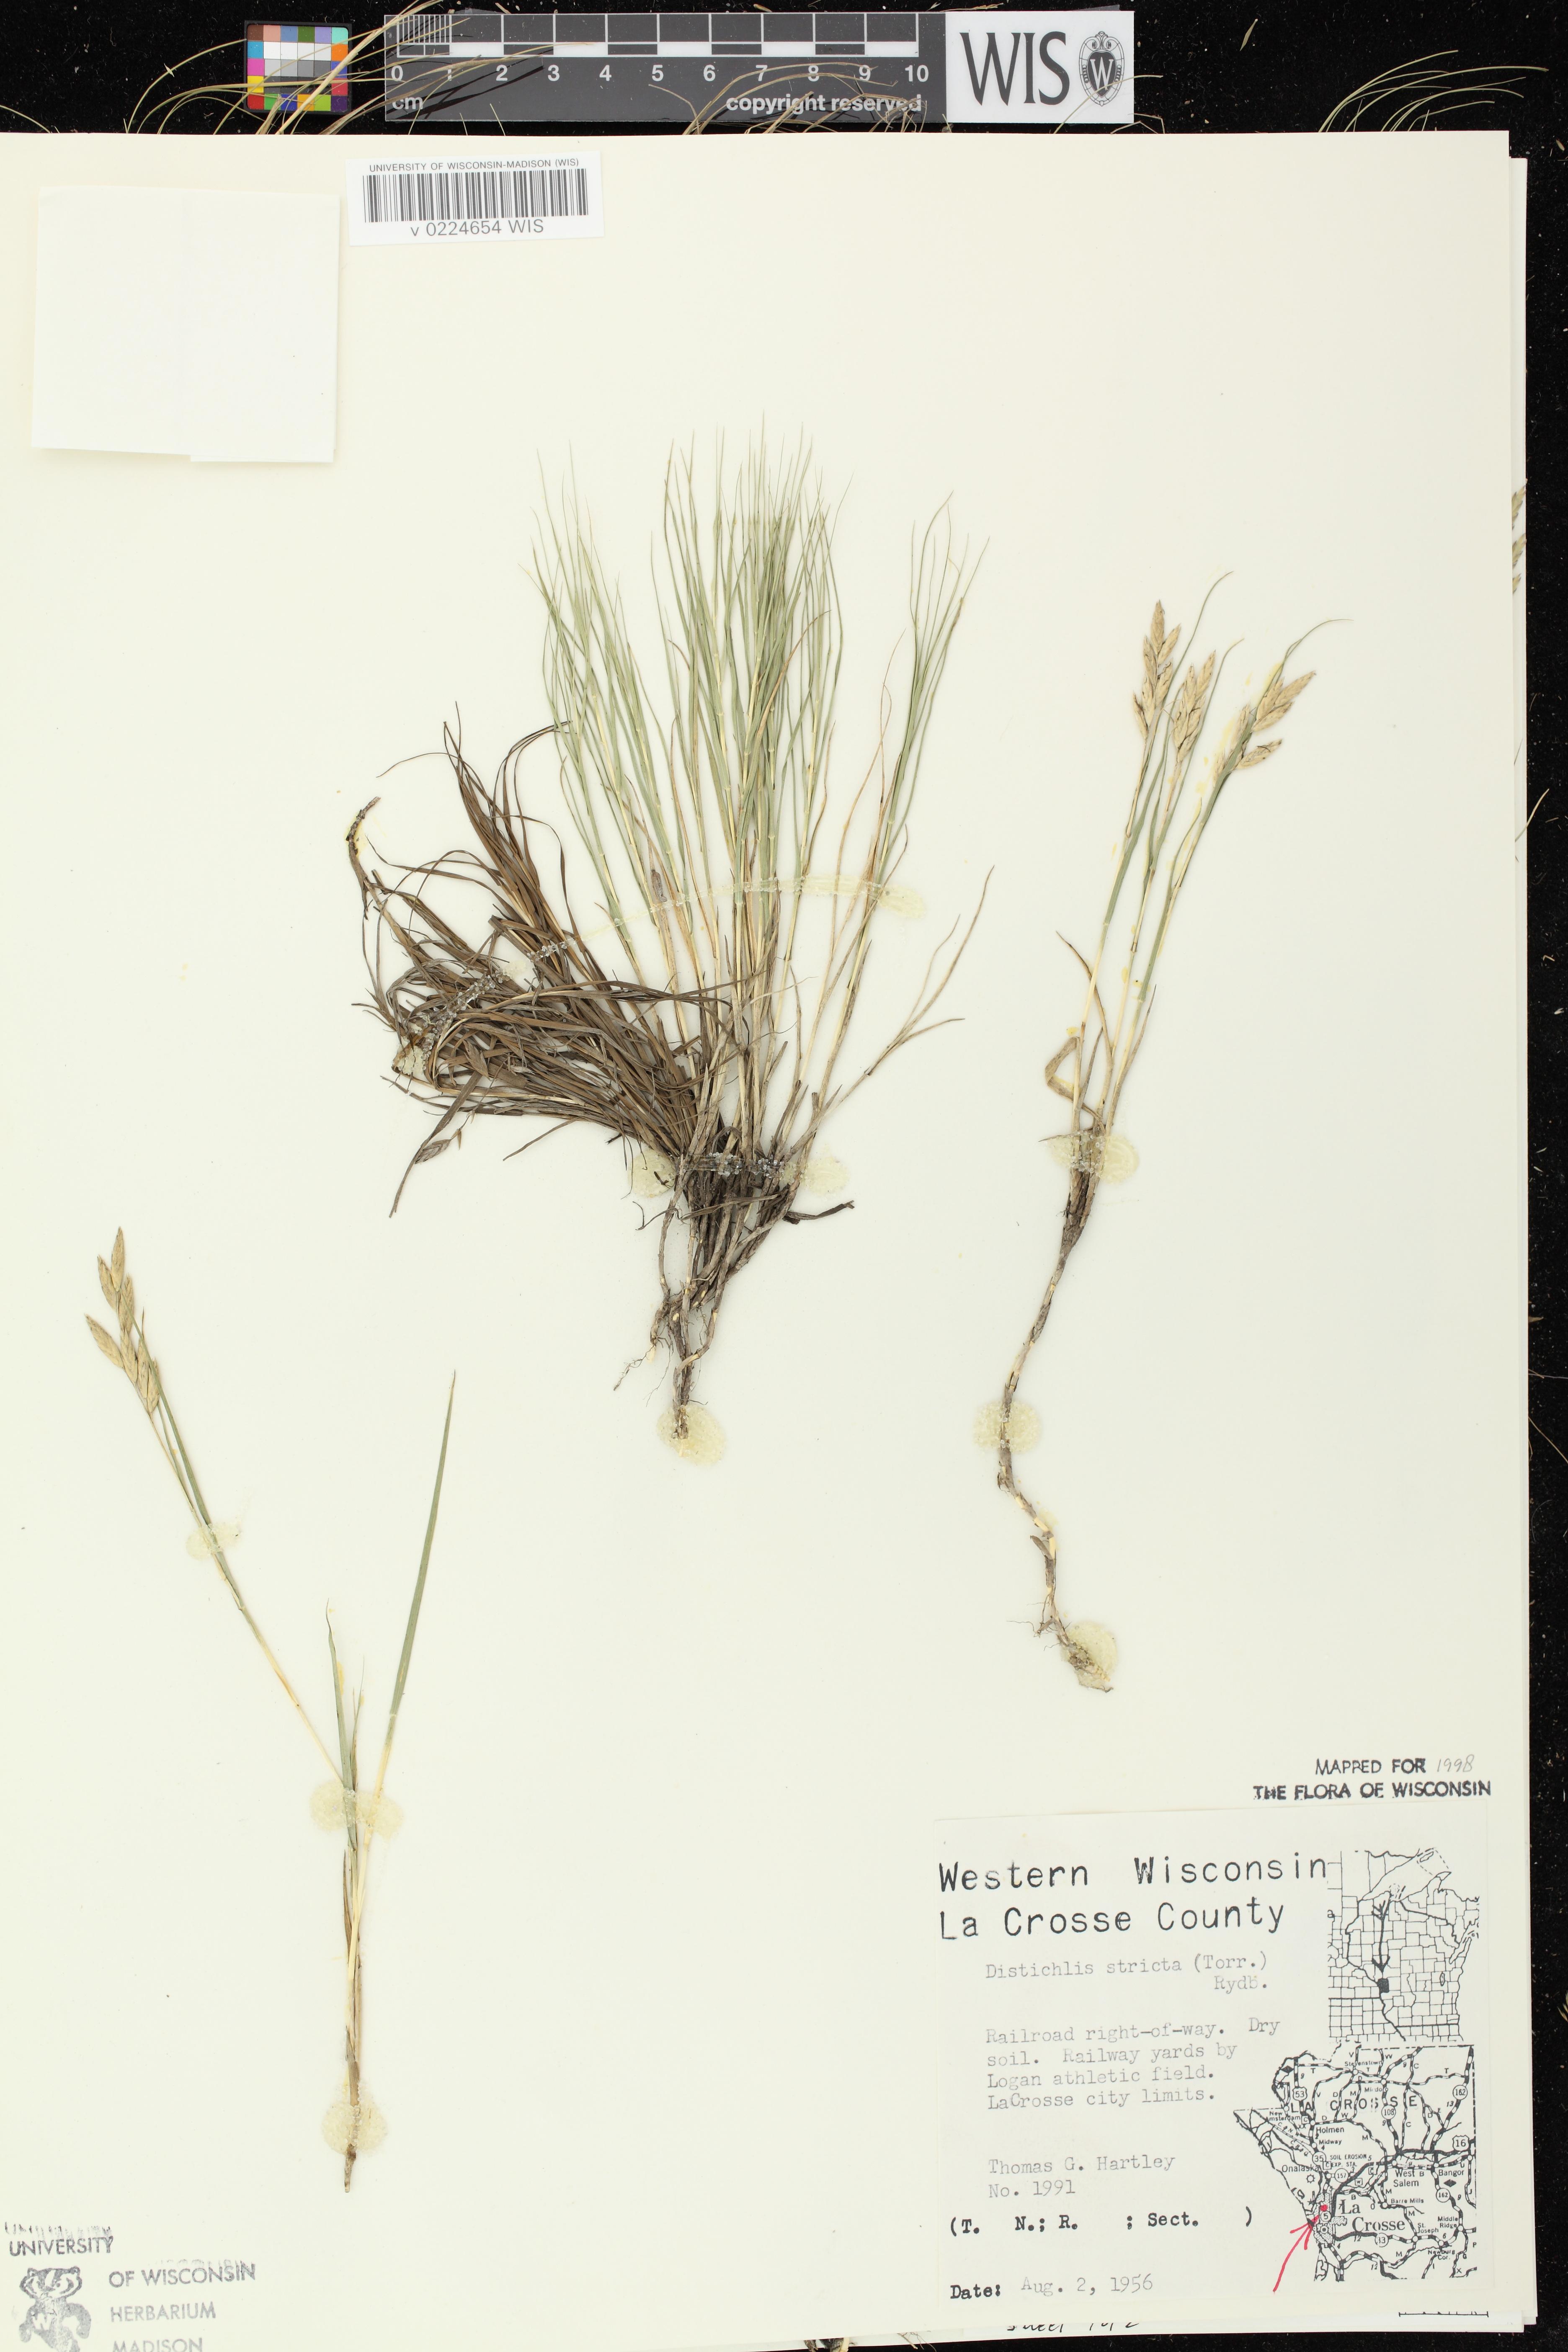 Image of Distichlis spicata